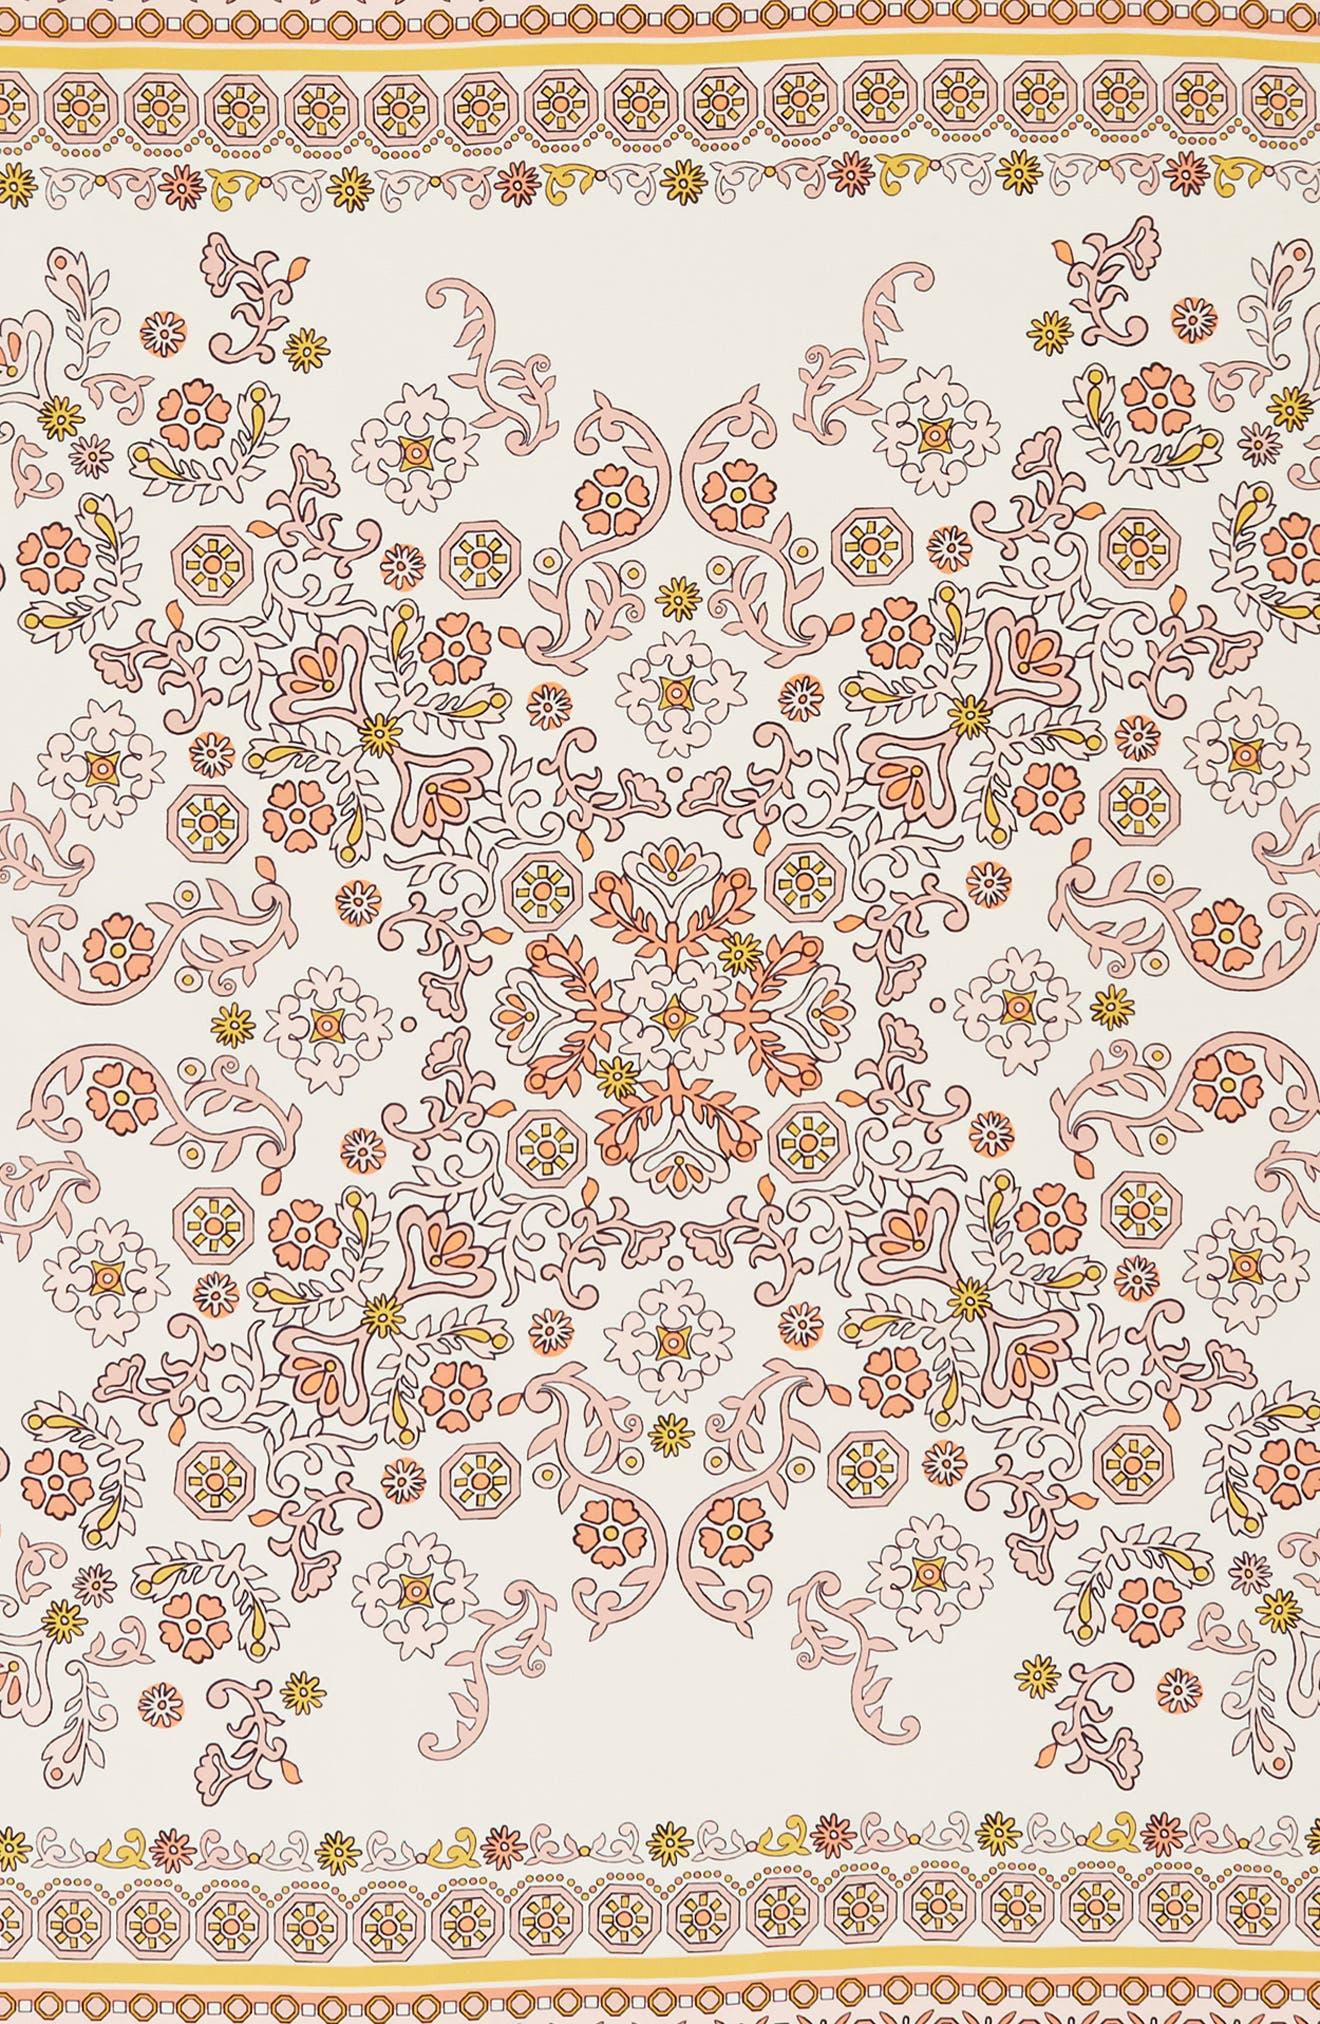 Hicks Garden Fringed Silk Scarf,                             Alternate thumbnail 4, color,                             Neutral